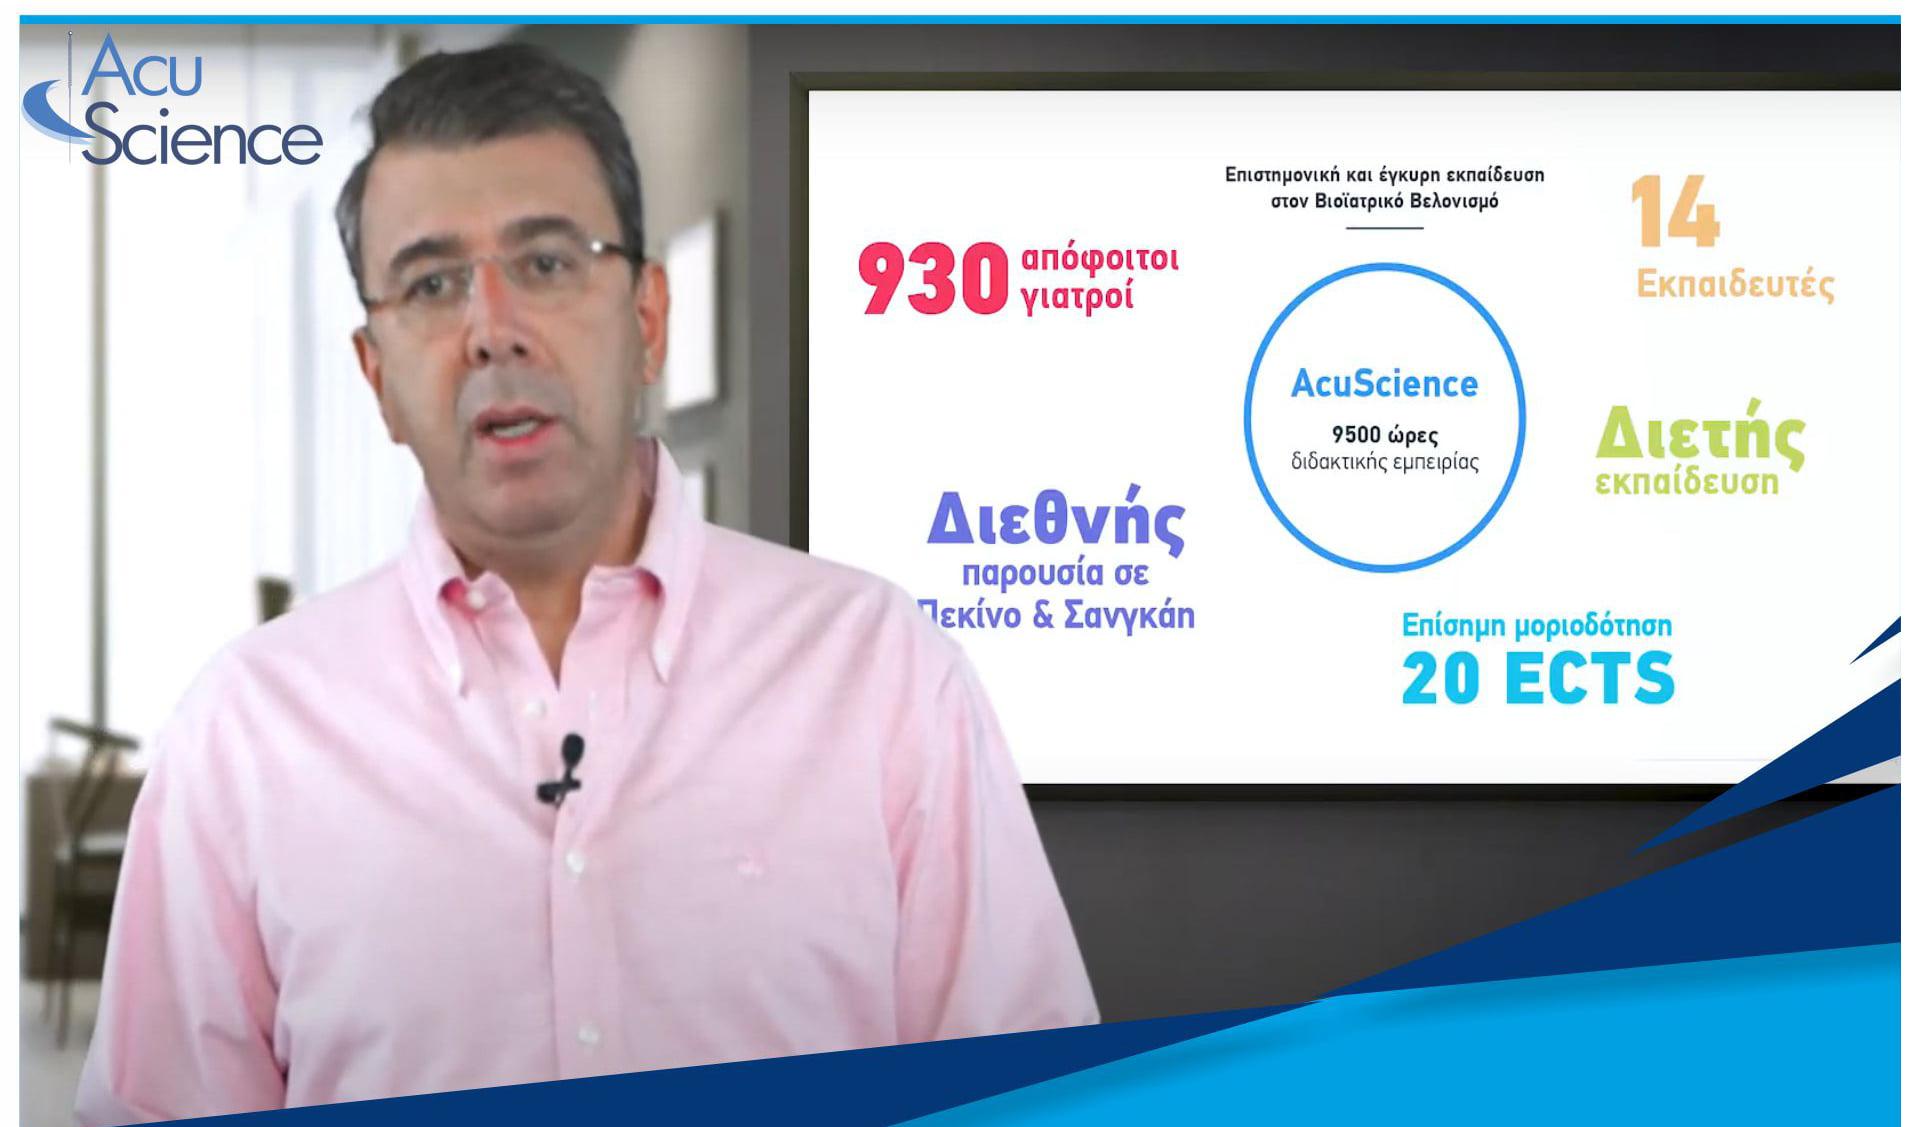 Acuscience 1o Live Streaming